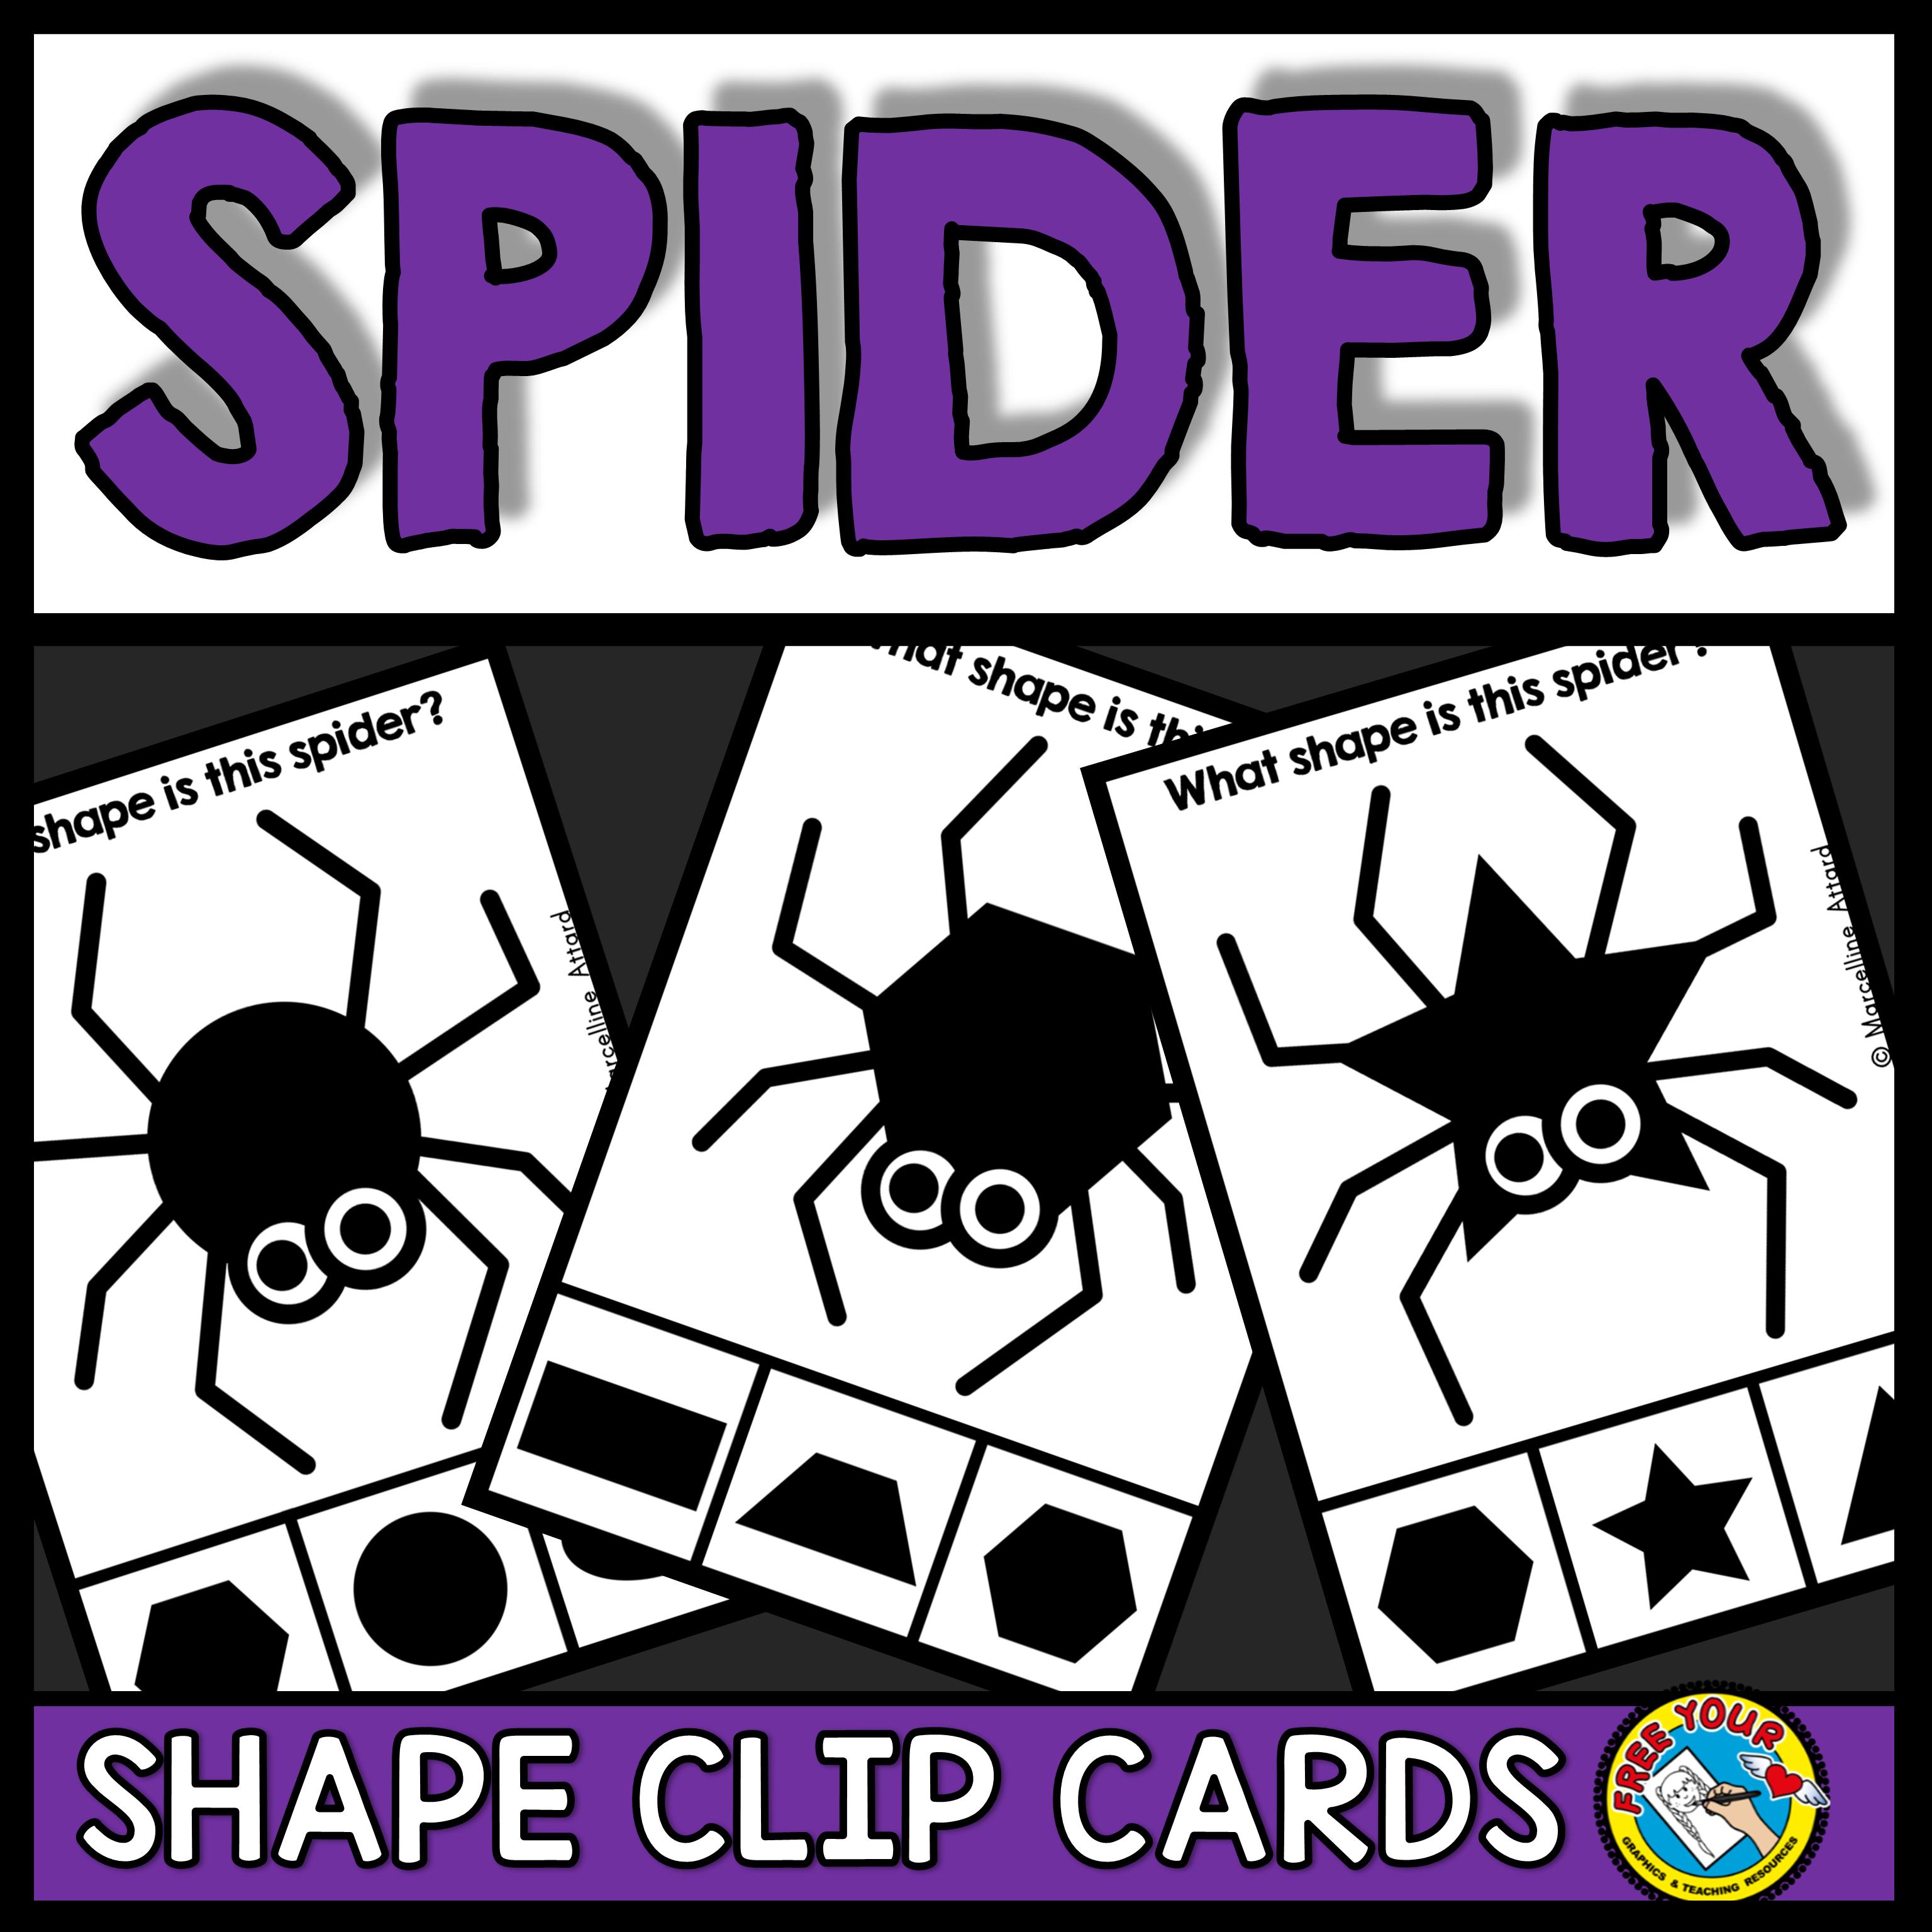 Spider Shapes Clip Cards This Fun Math Center Focusing On 2d Shapes Will Surely Enga Math Kindergarten Shapes Halloween Activities Preschool Fun Math Centers [ 3072 x 3072 Pixel ]